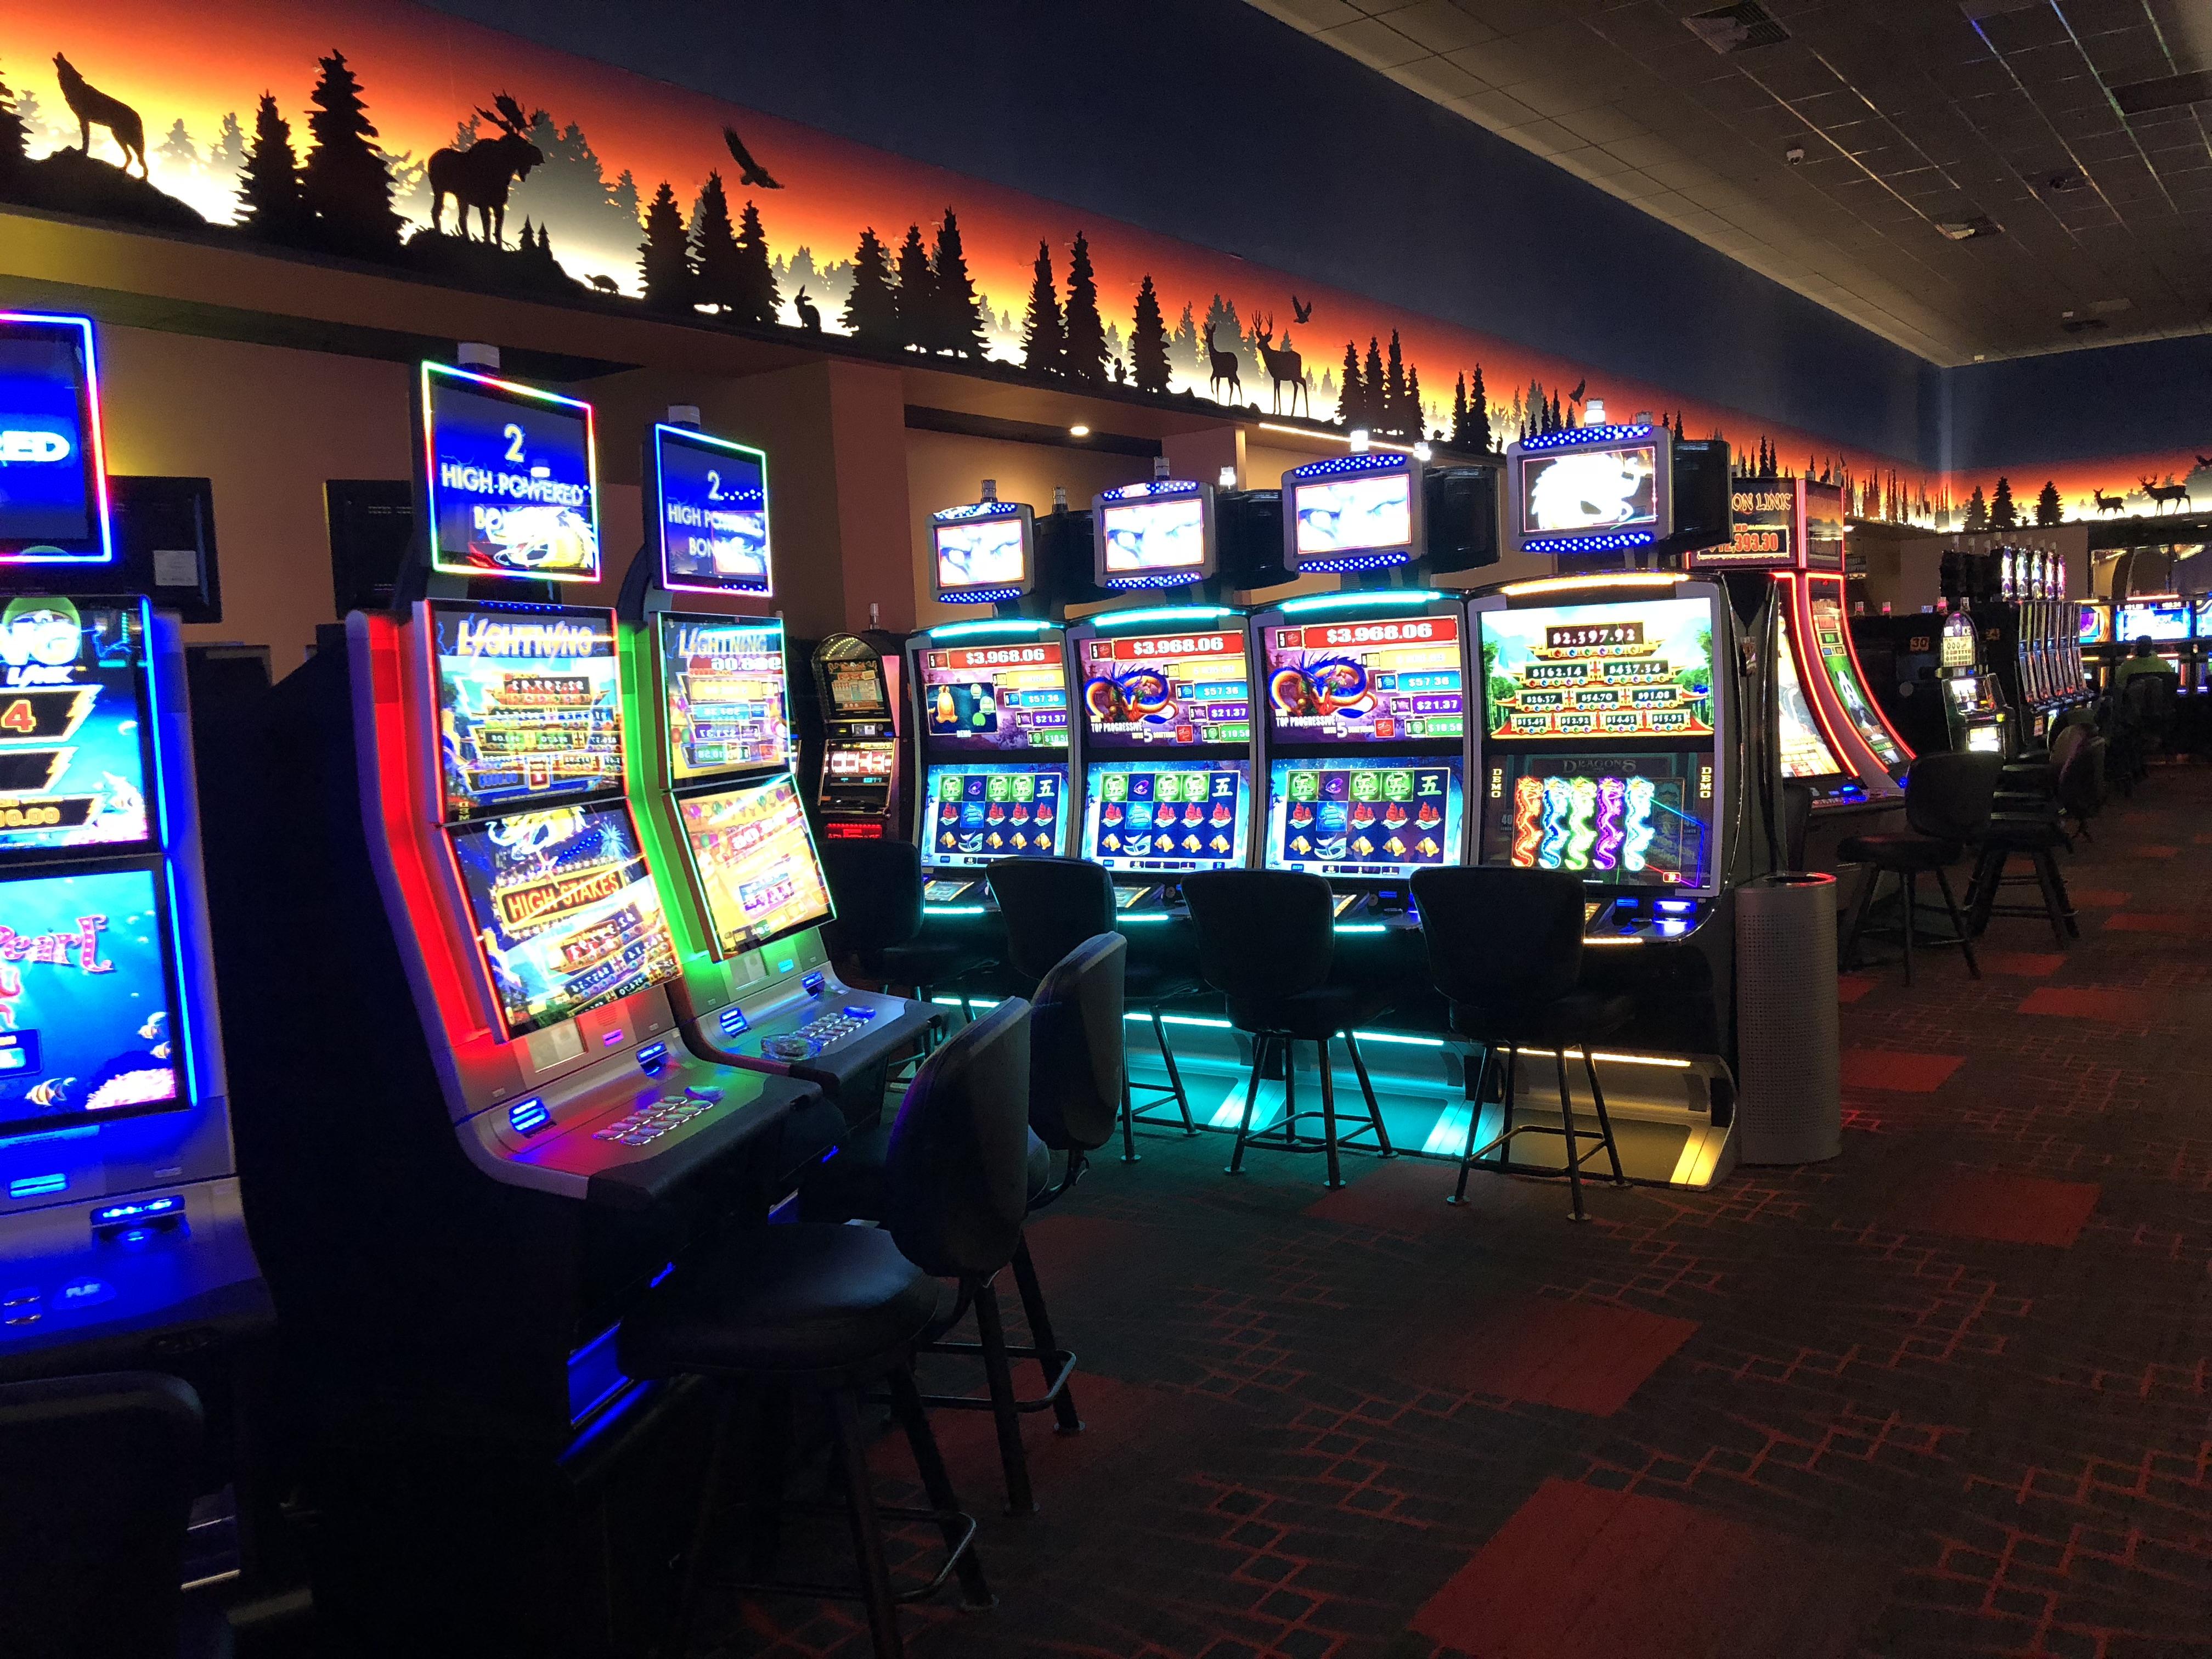 Lac vieux desert casino michigan florida legal gambling attorney jobs